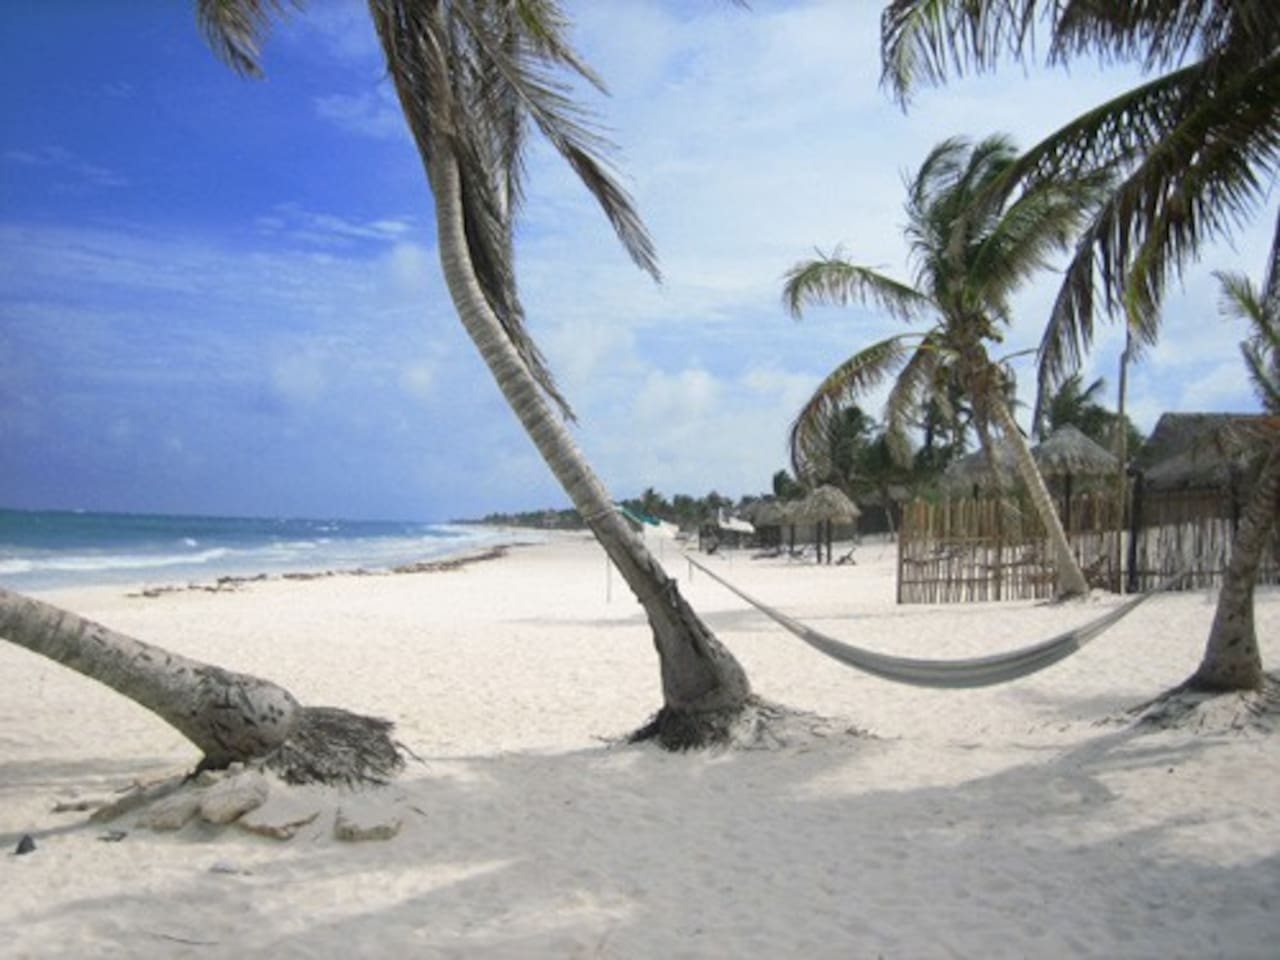 Beach in Playa del Carmen 2.5 blocks from Palma Cocos